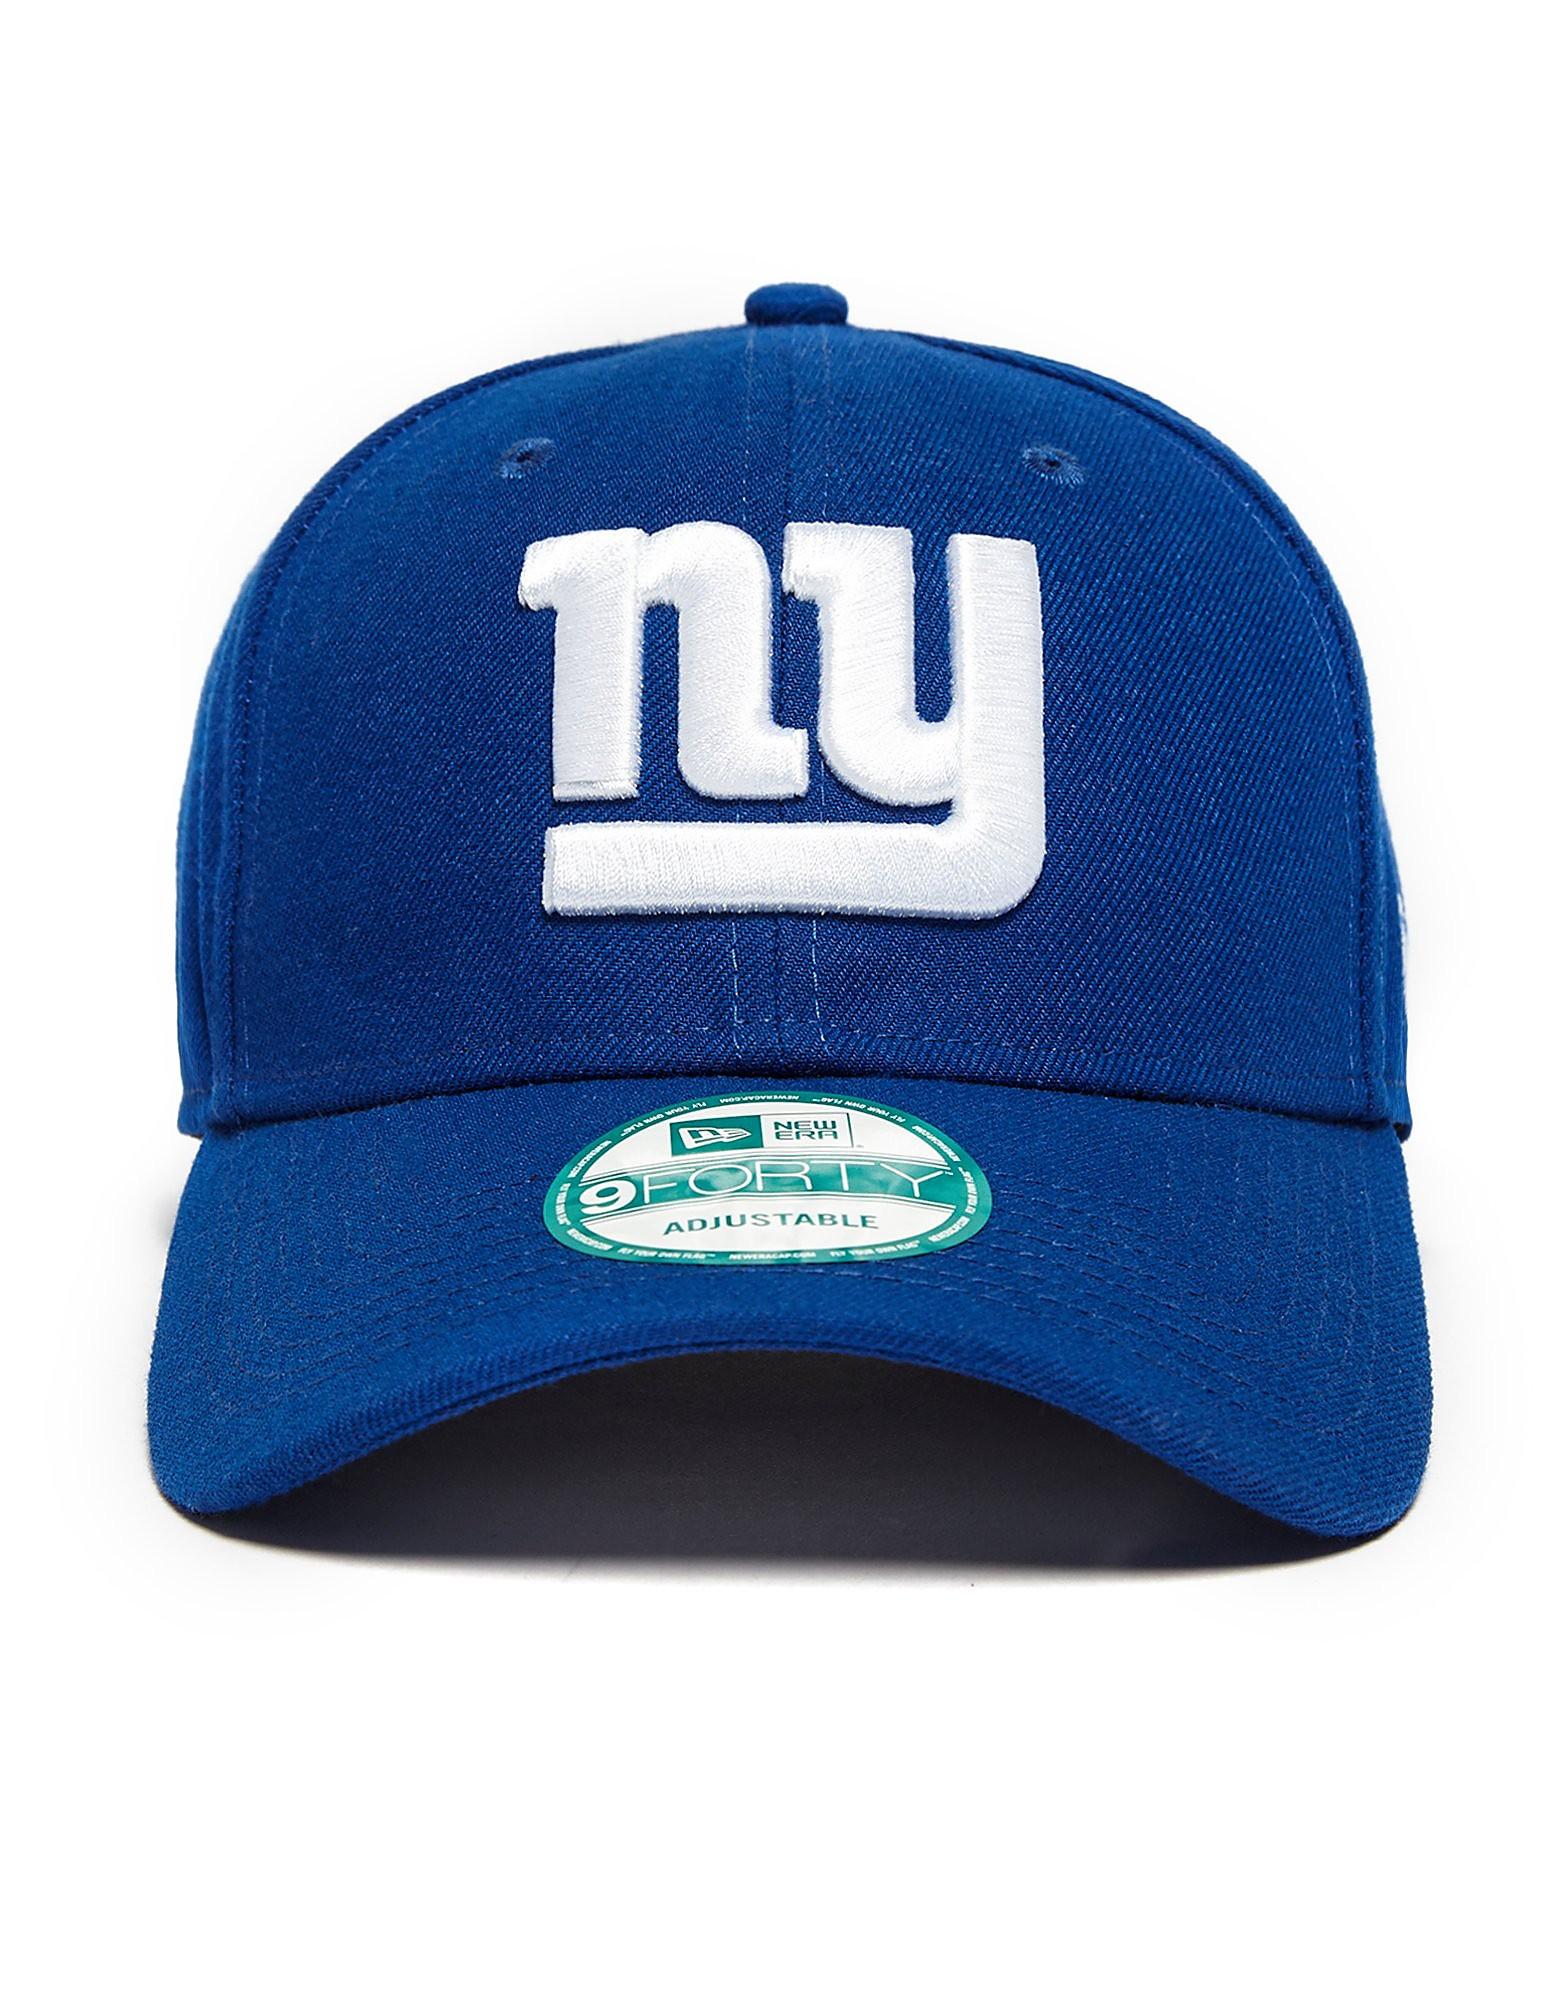 New Era 9FORTY NFL New York Giants Cap